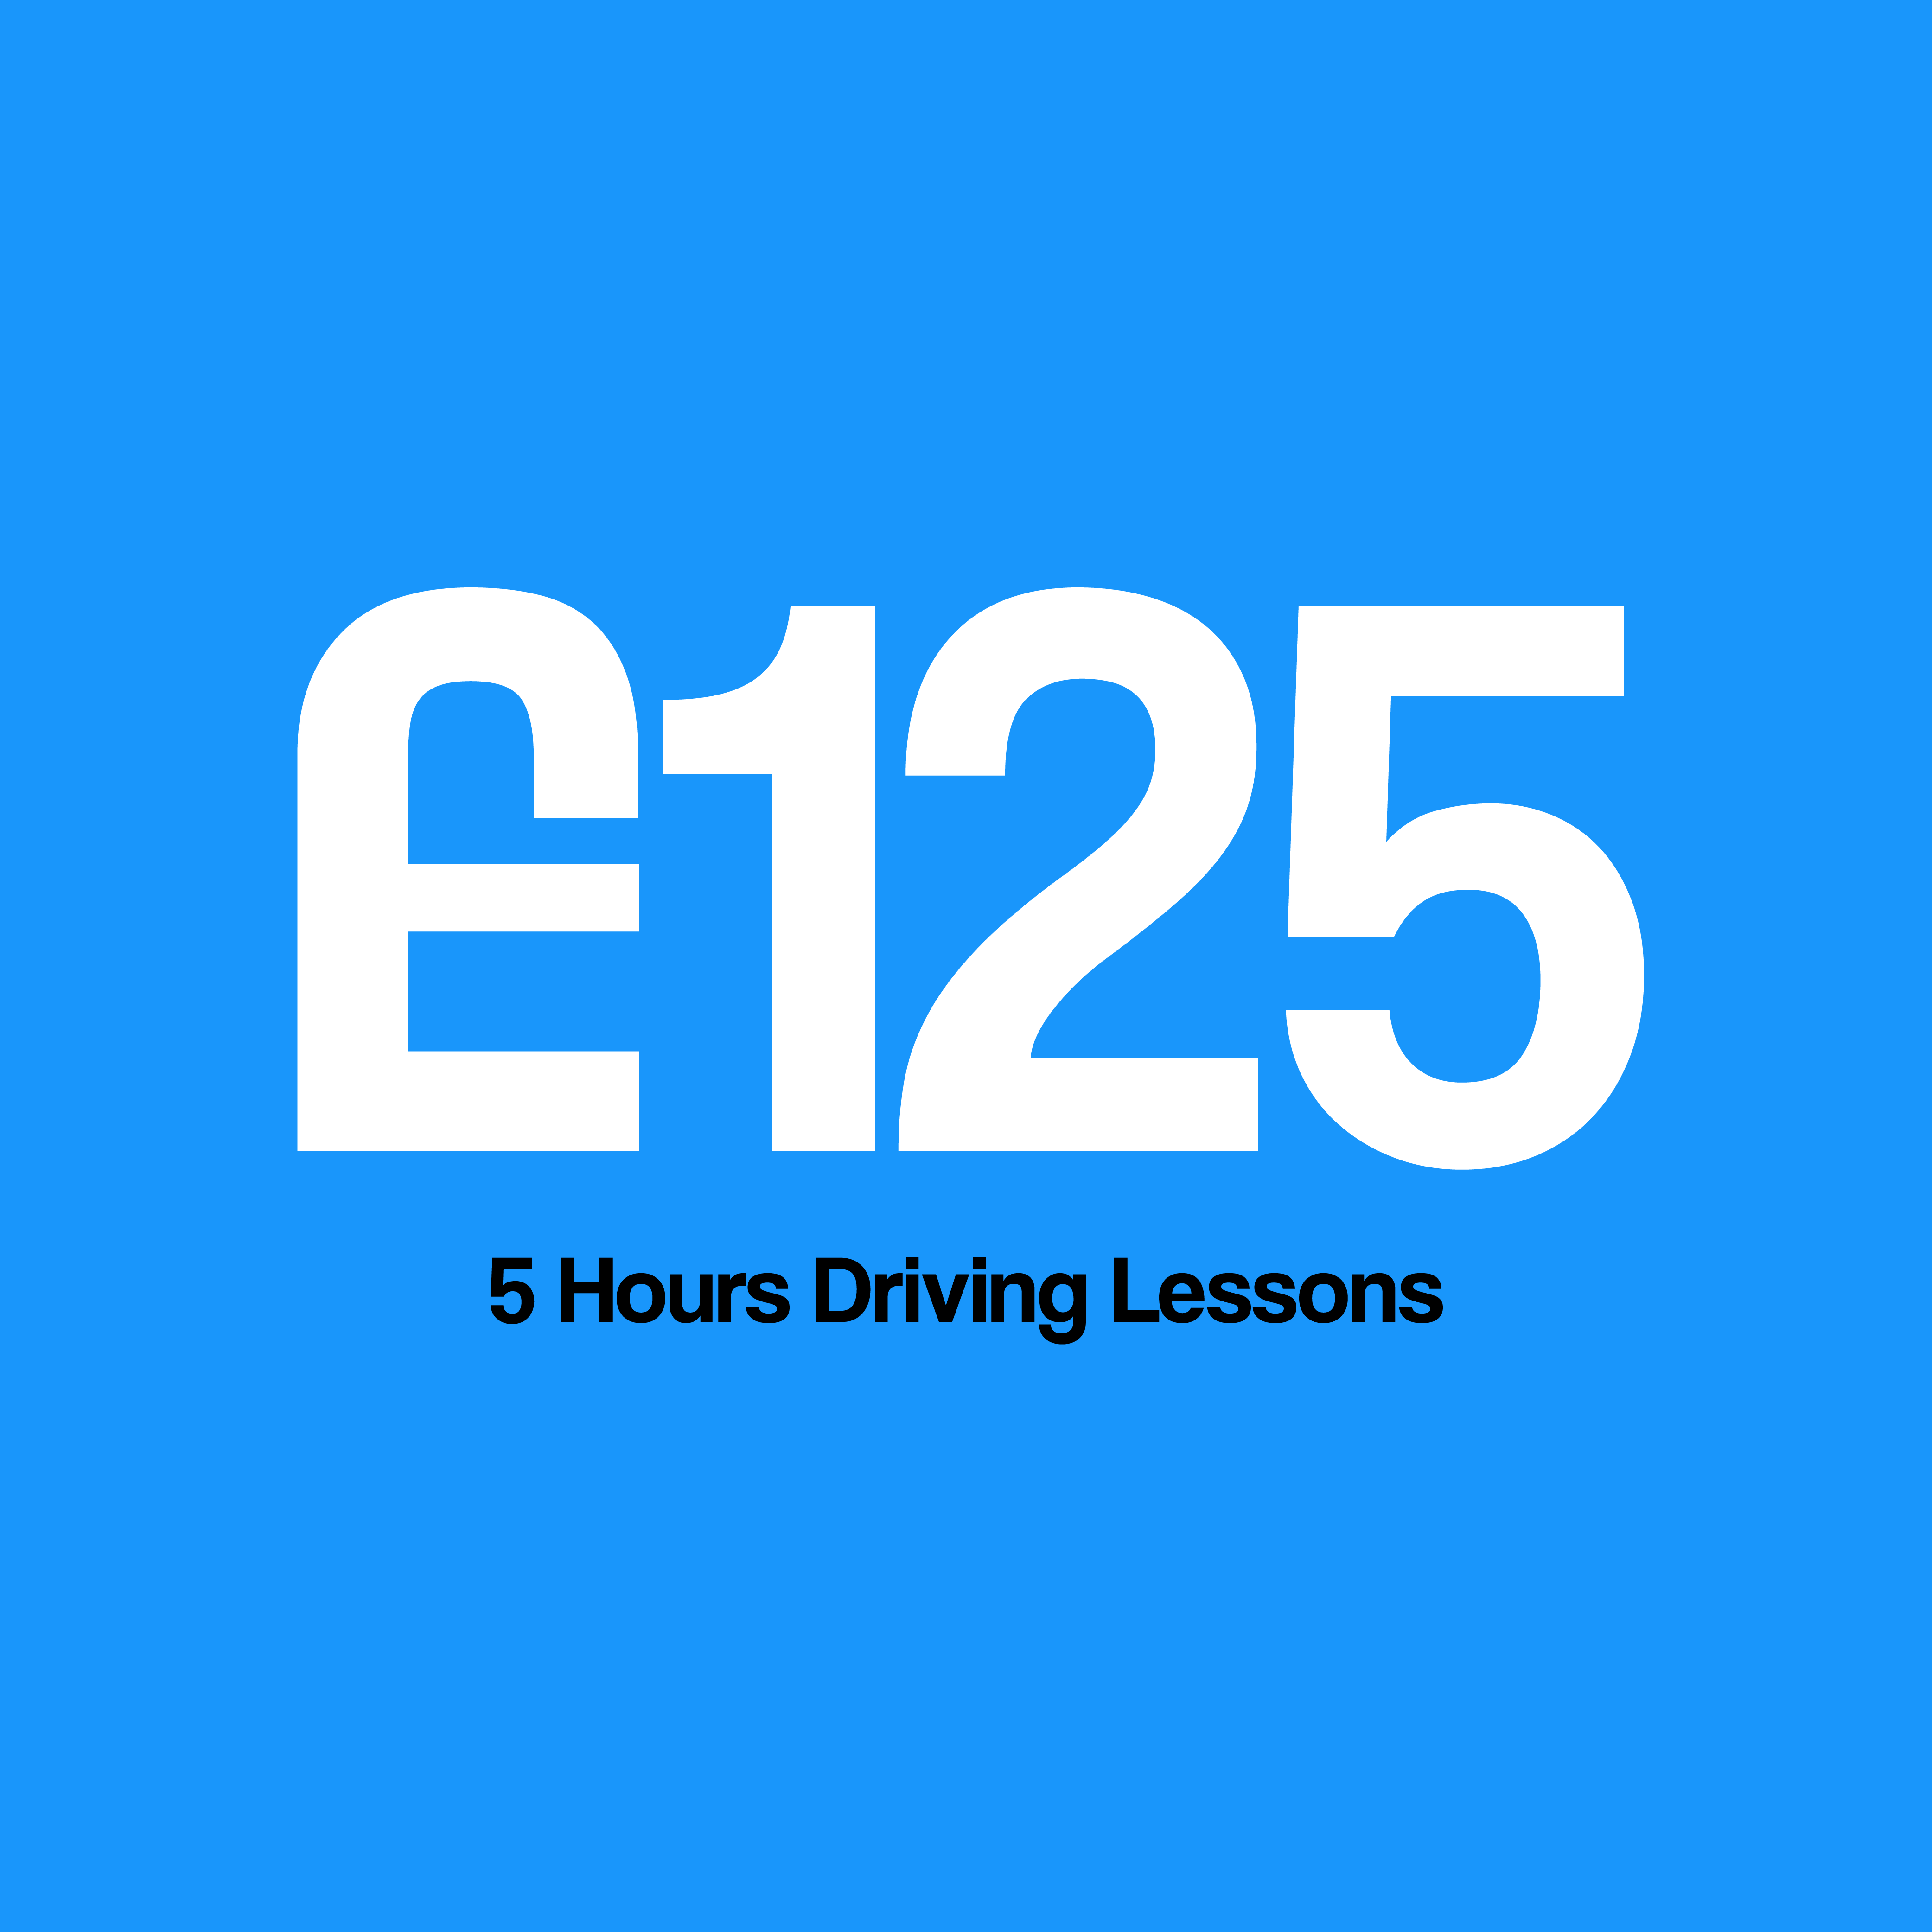 DSM School Of Motoring 5 Hours Driving Lessons